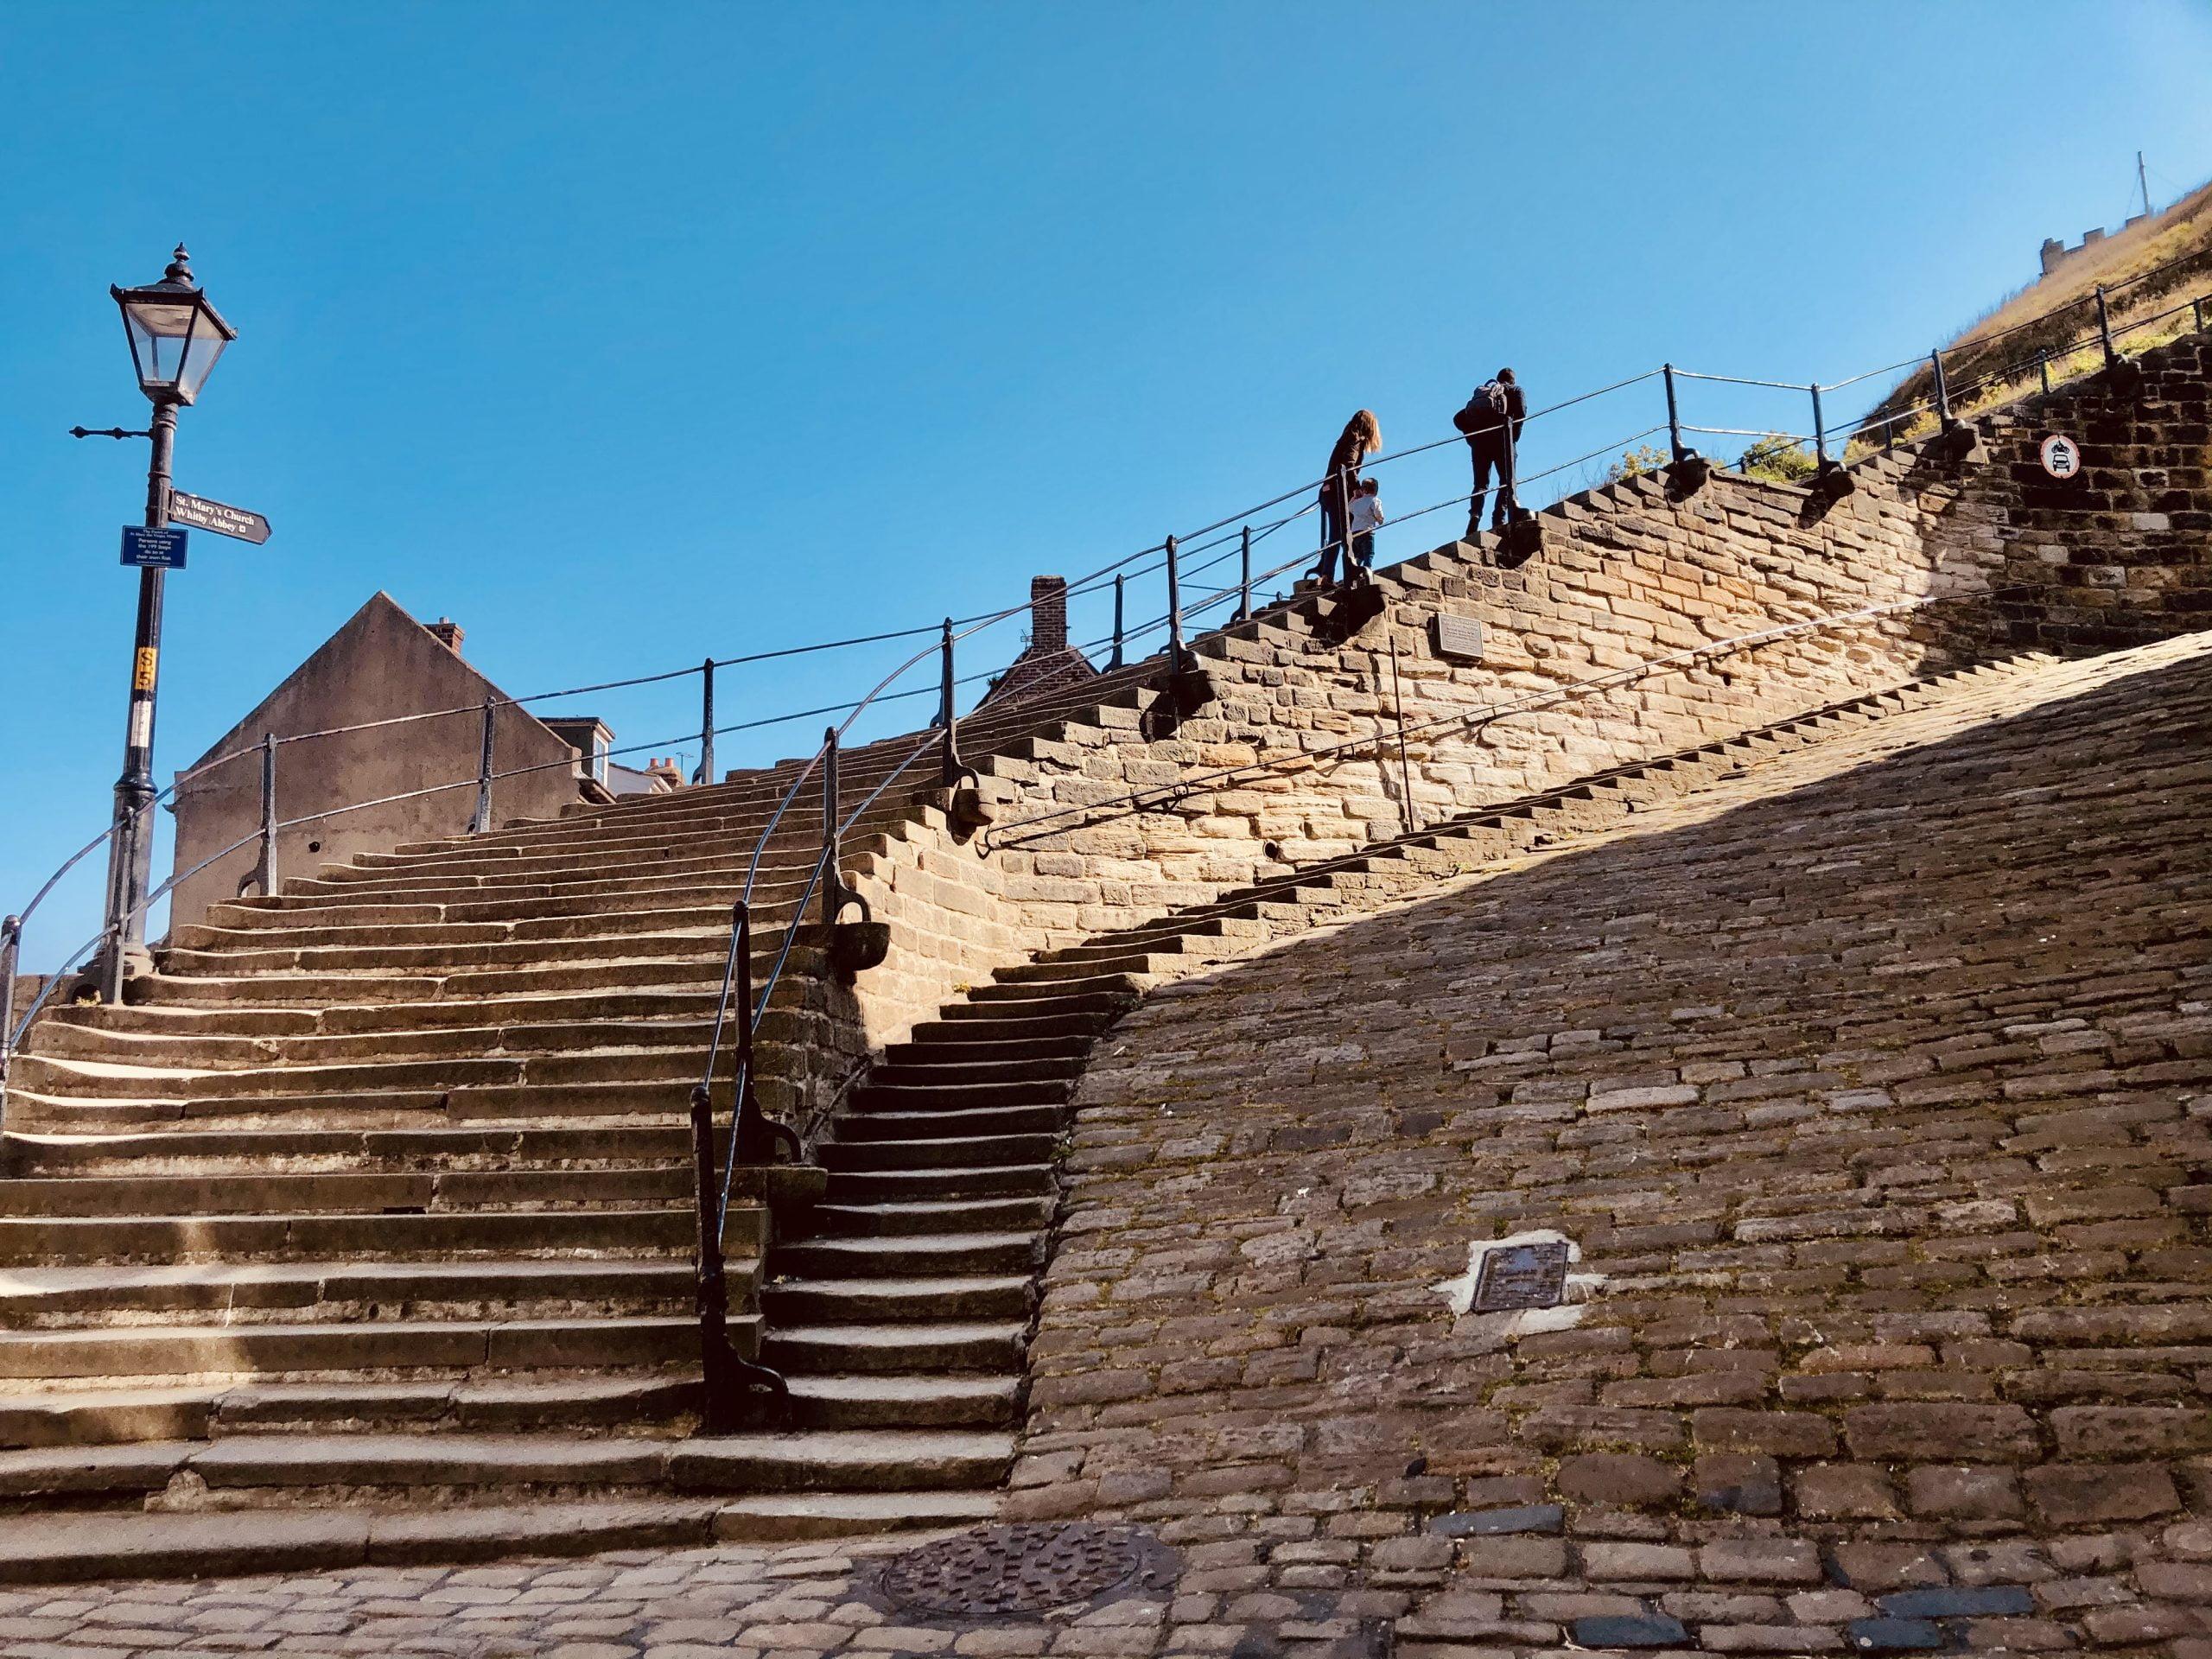 199 Steps